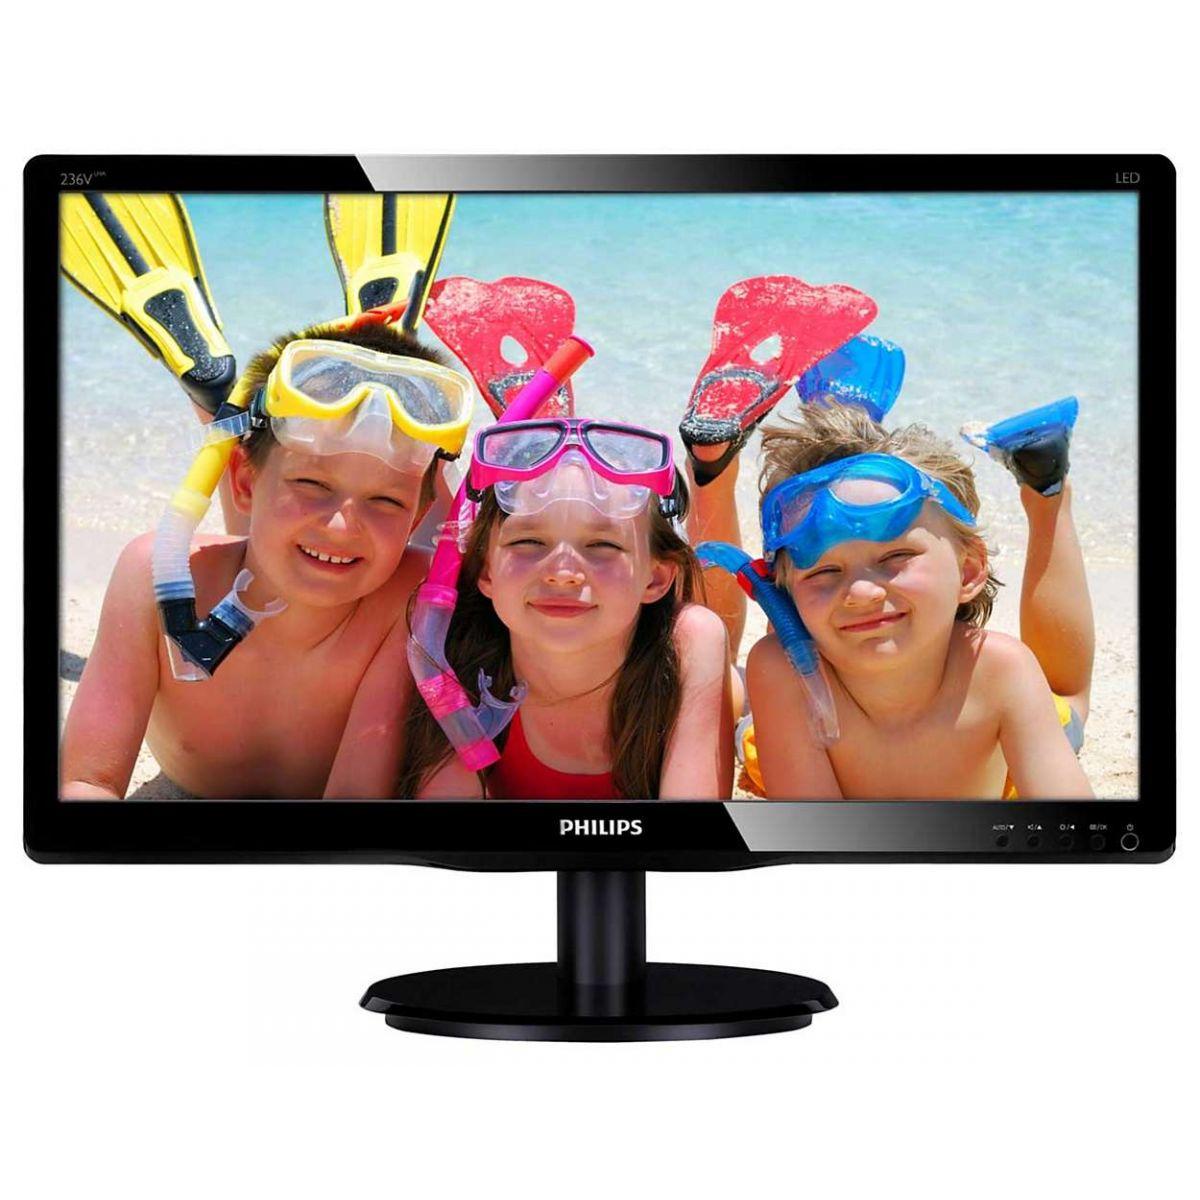 Monitor LED 23 Vesa 233V5QHABP Smartcontrol - Philips